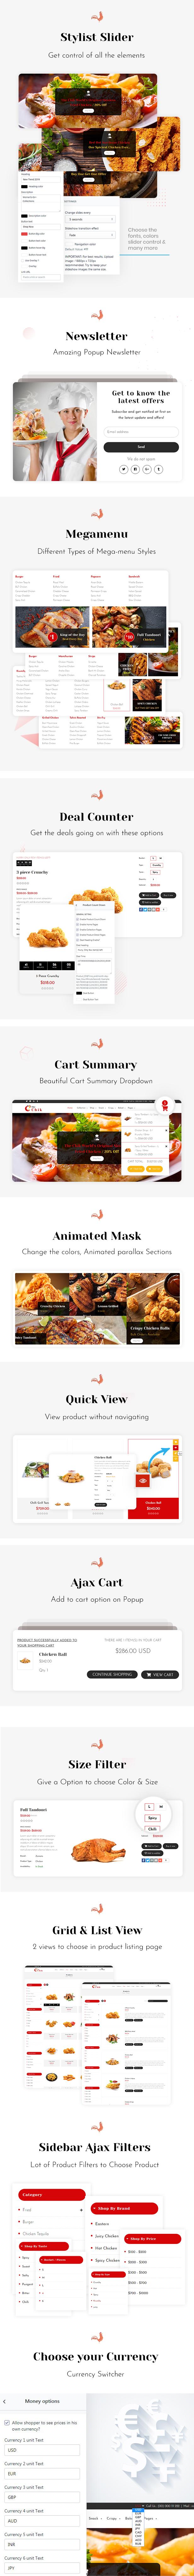 Chik | Chicken Restaurant Shopify Theme - 2